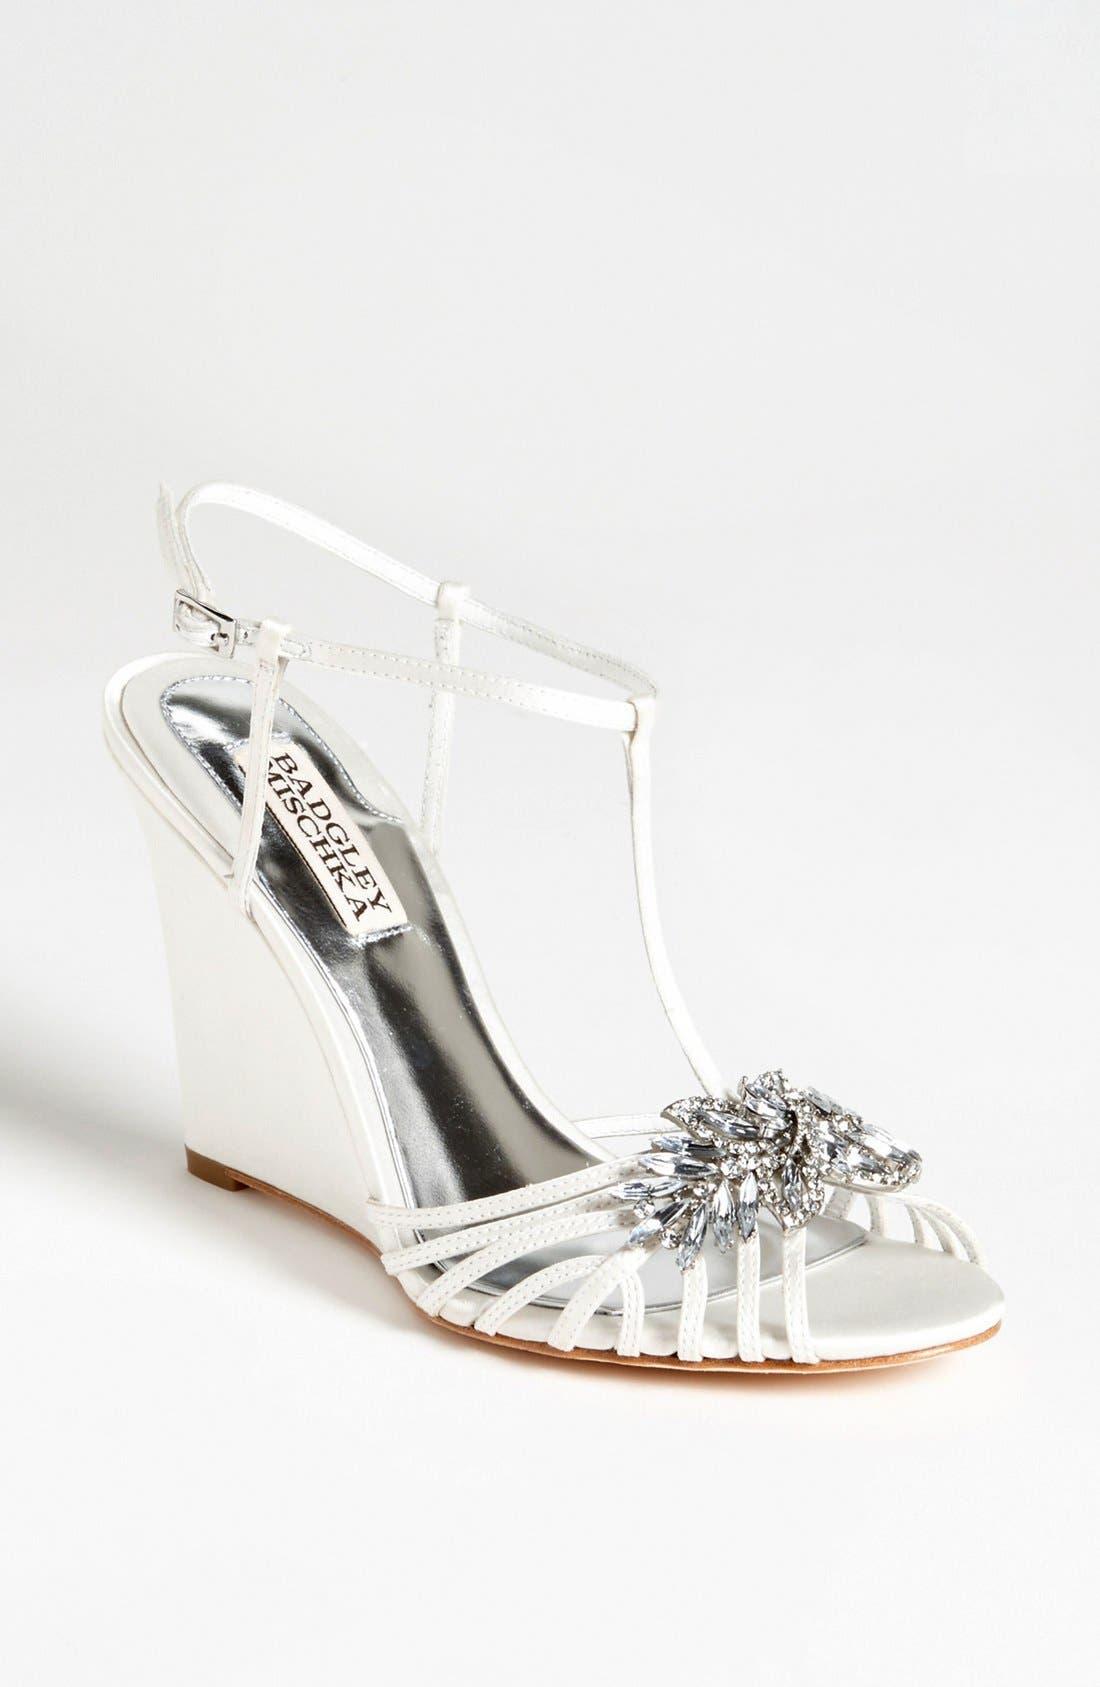 Alternate Image 1 Selected - Badgley Mischka 'Naomi' Wedge Sandal